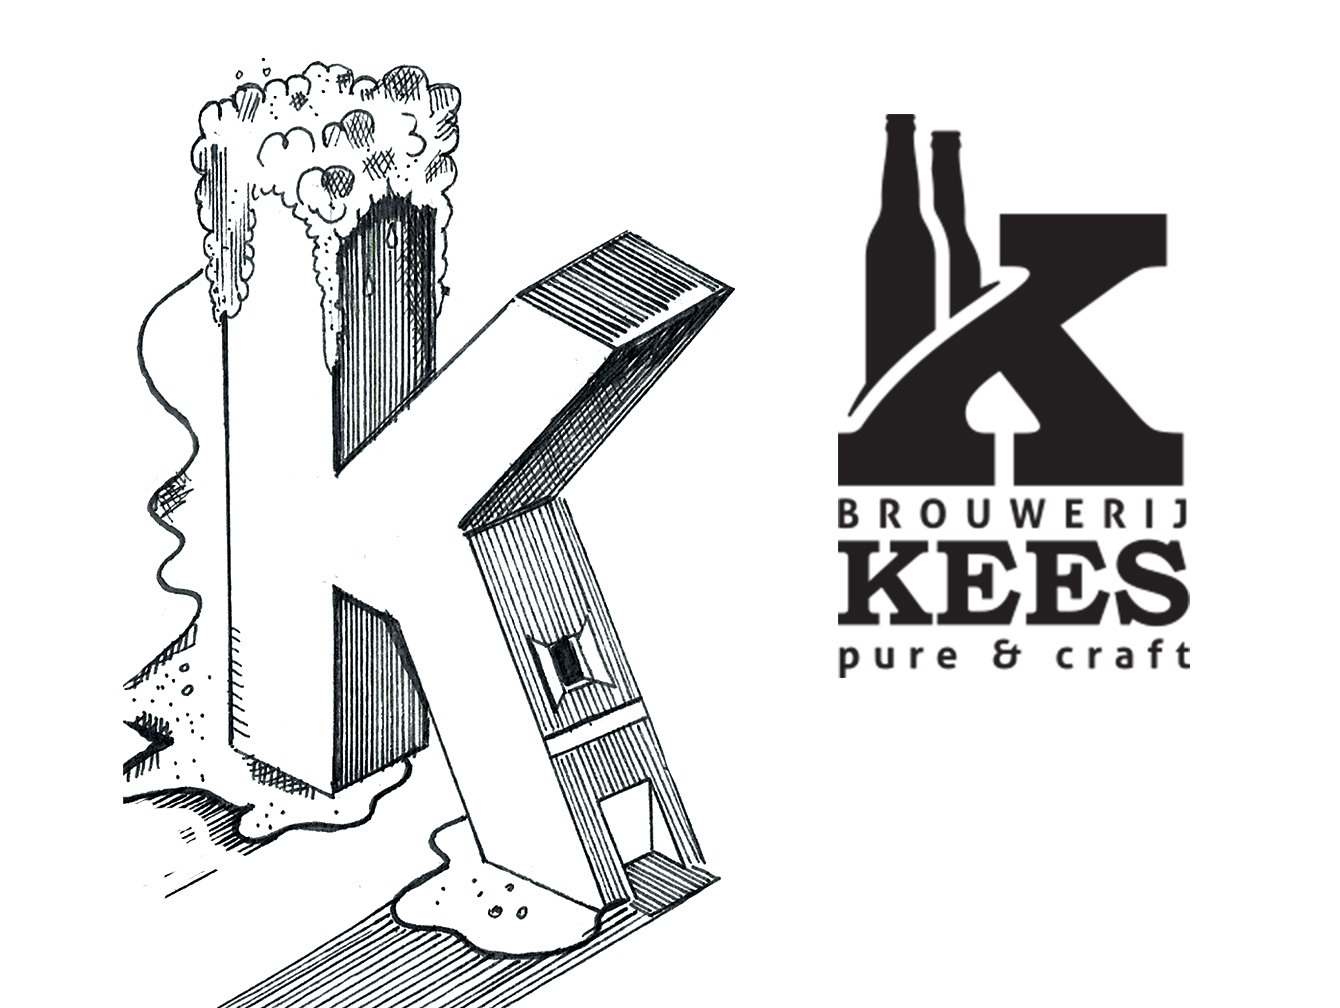 The Brewery Brouwerij Kees